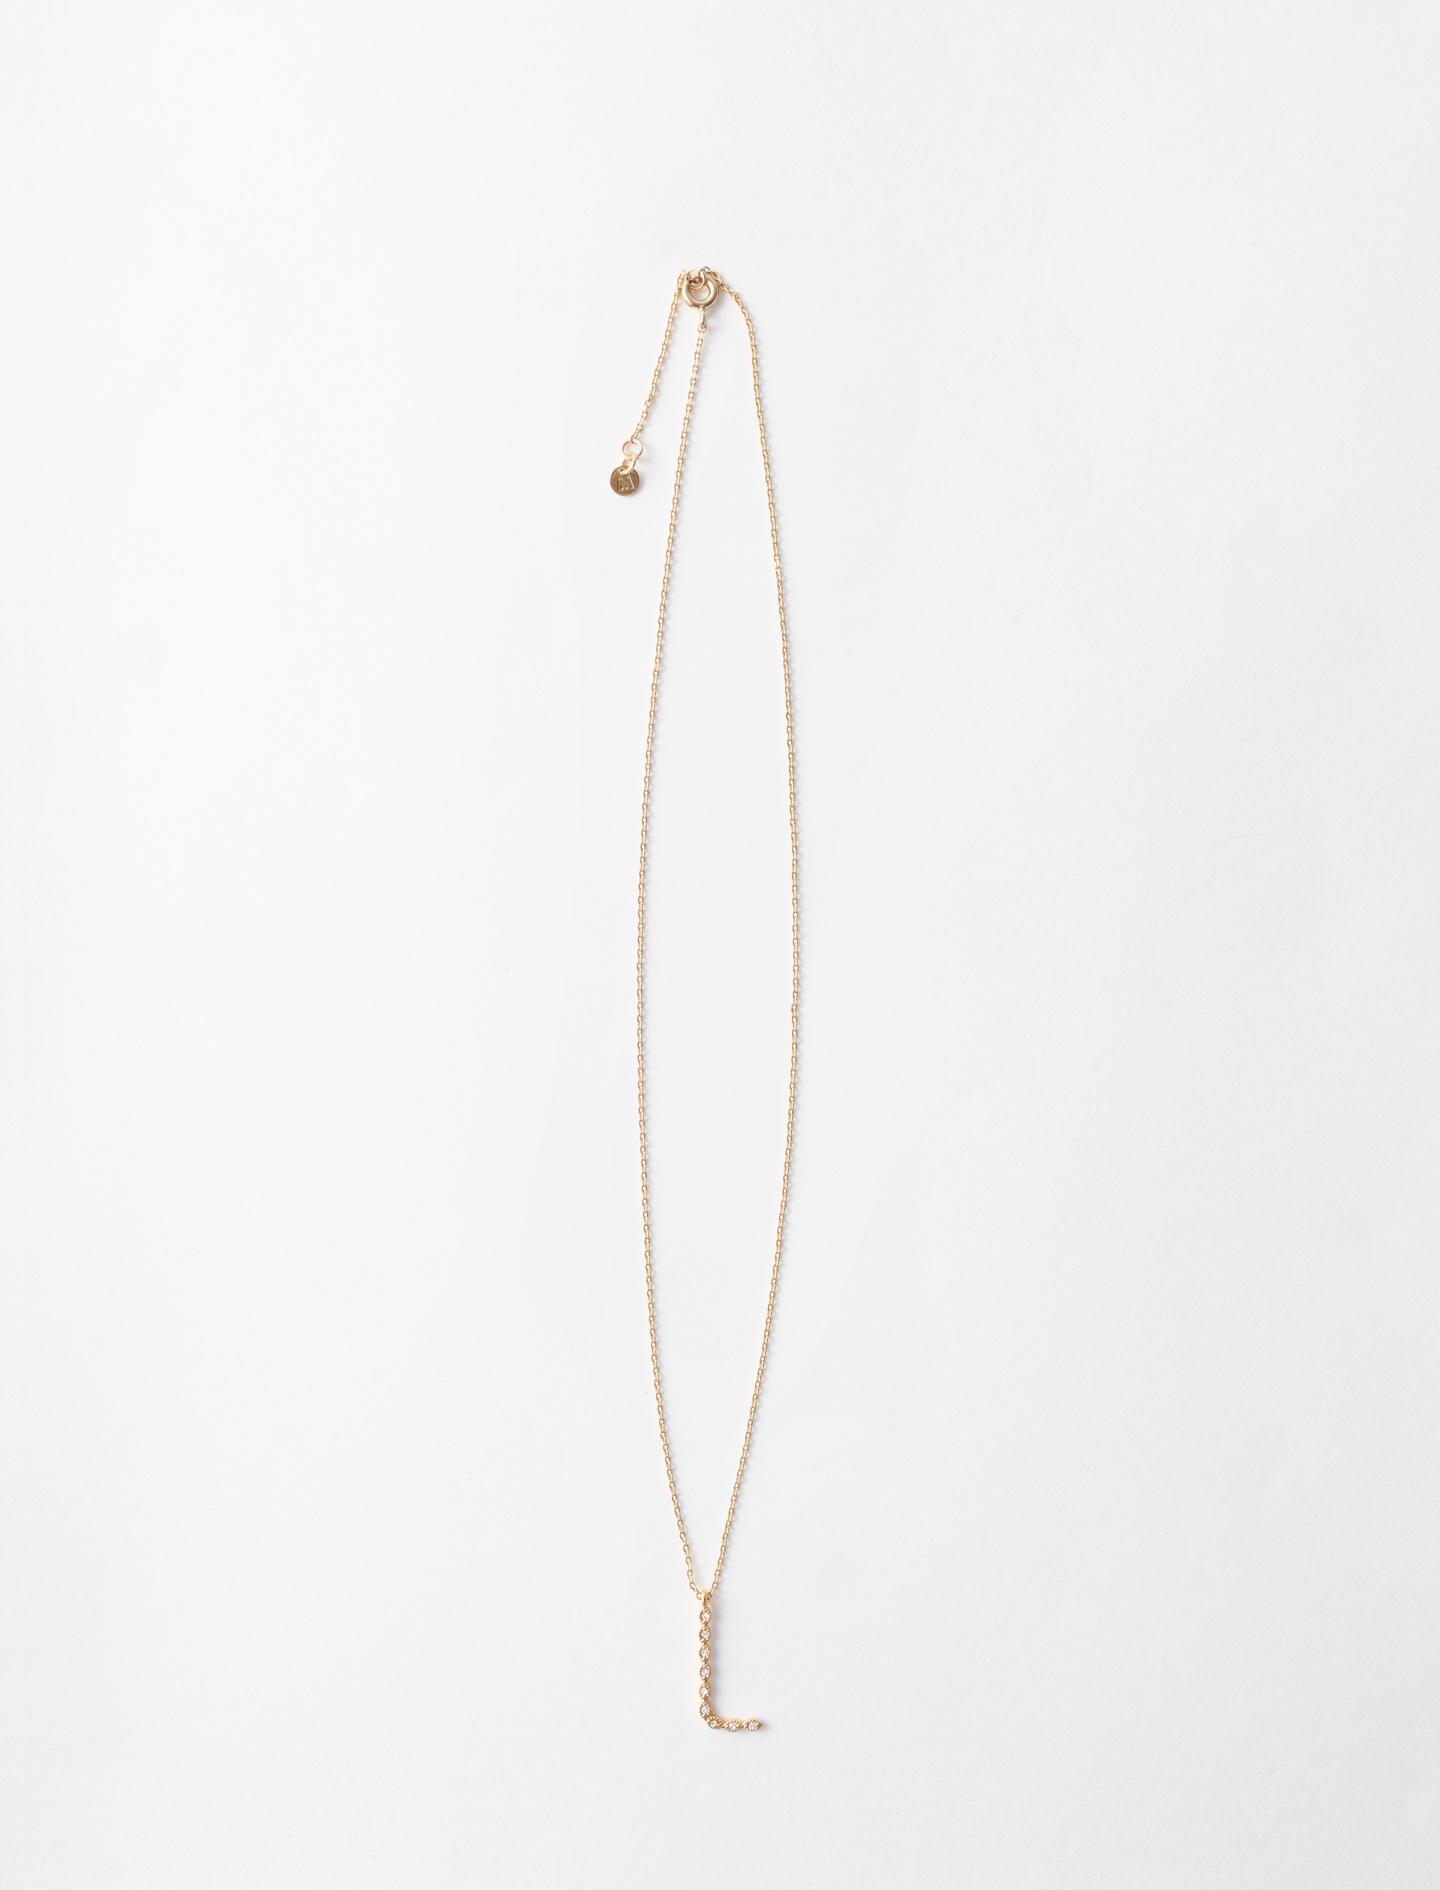 Rhinestone L necklace - Gold